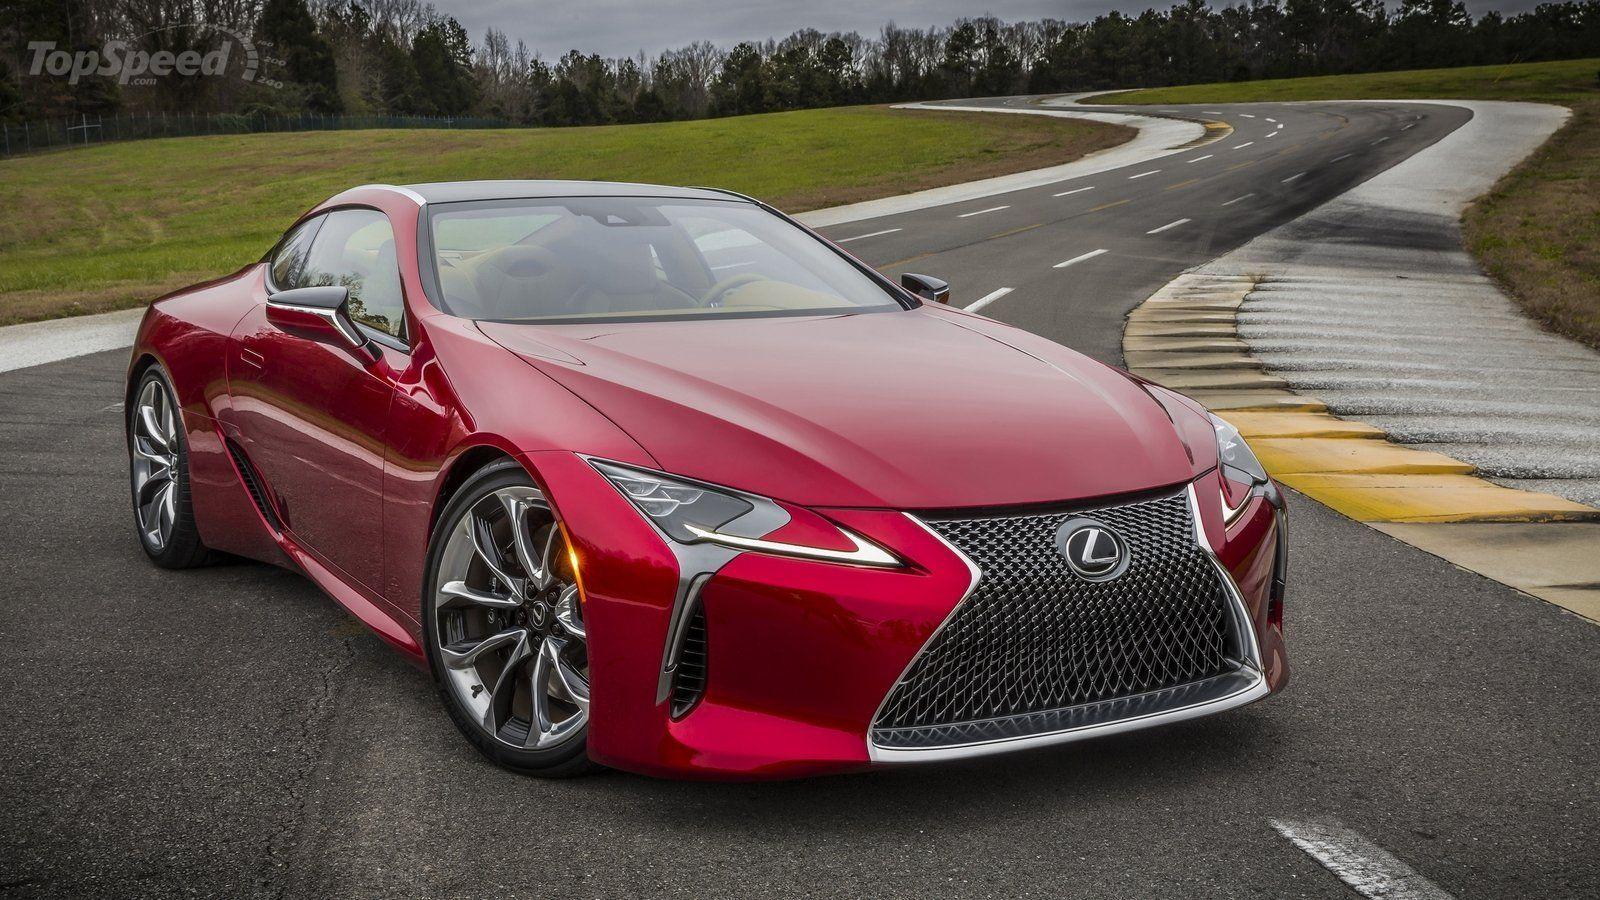 Lexus LC HighEnd Performance Httptopcarscom - Sports cars high end